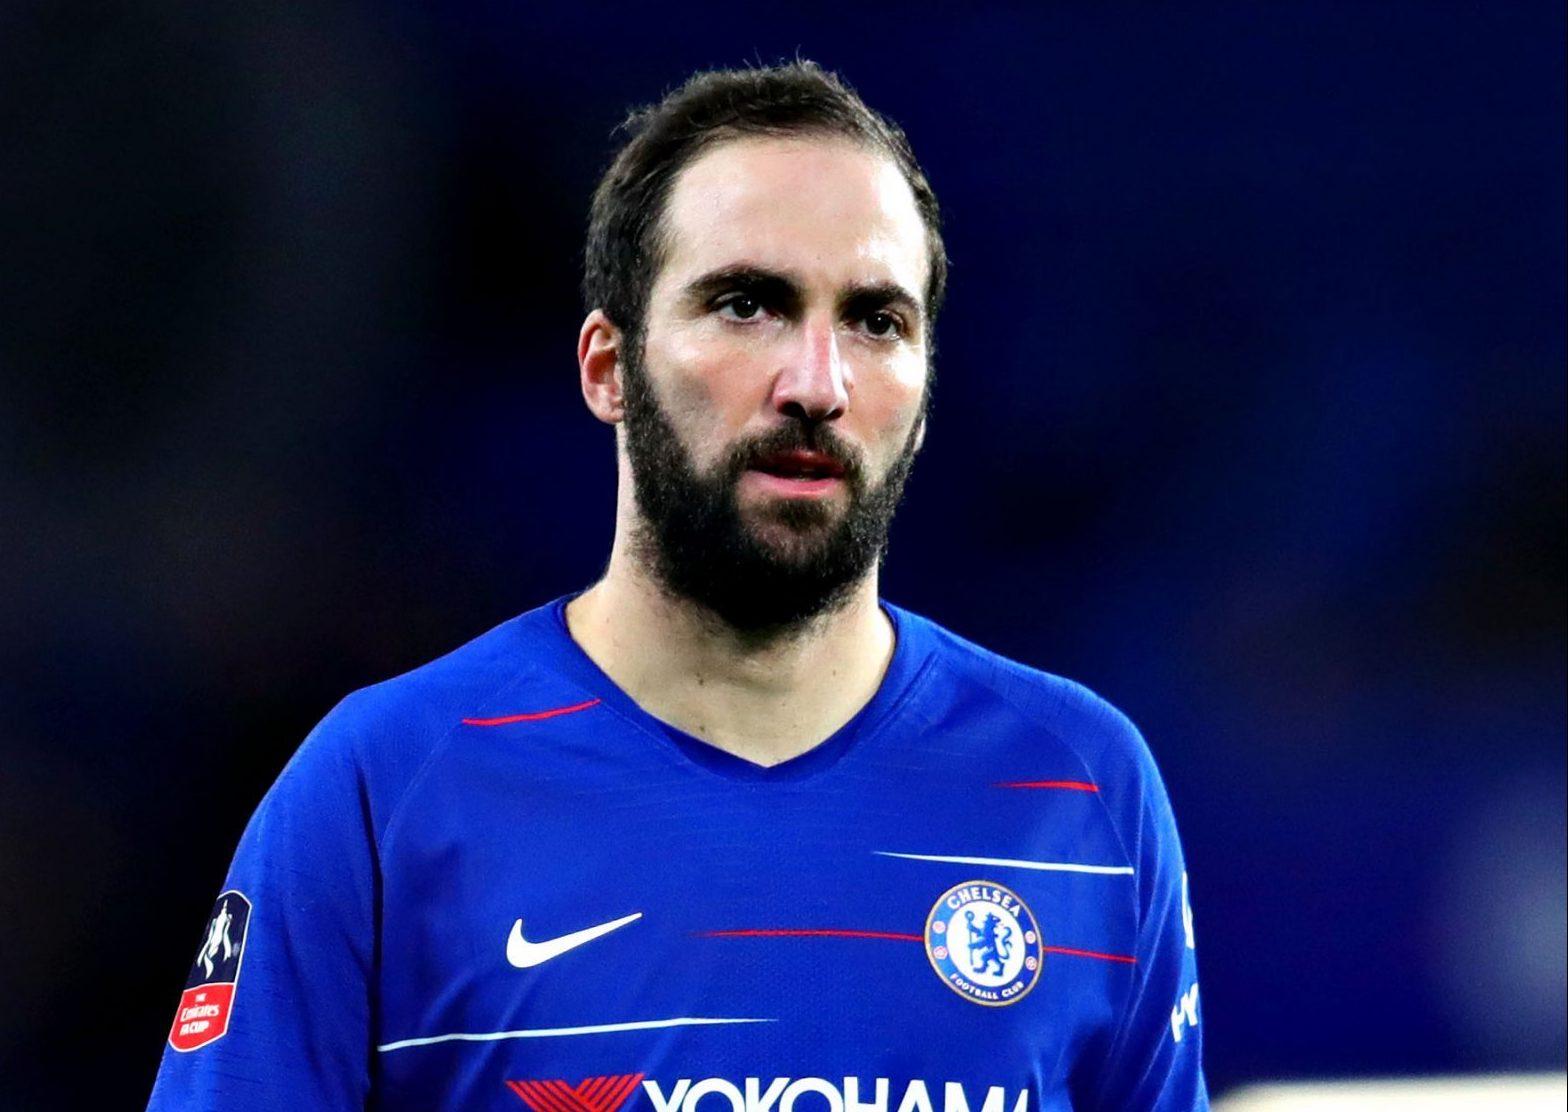 Maurizio Sarri issues Gonzalo Higuain injury update ahead of Chelsea's clash with Everton